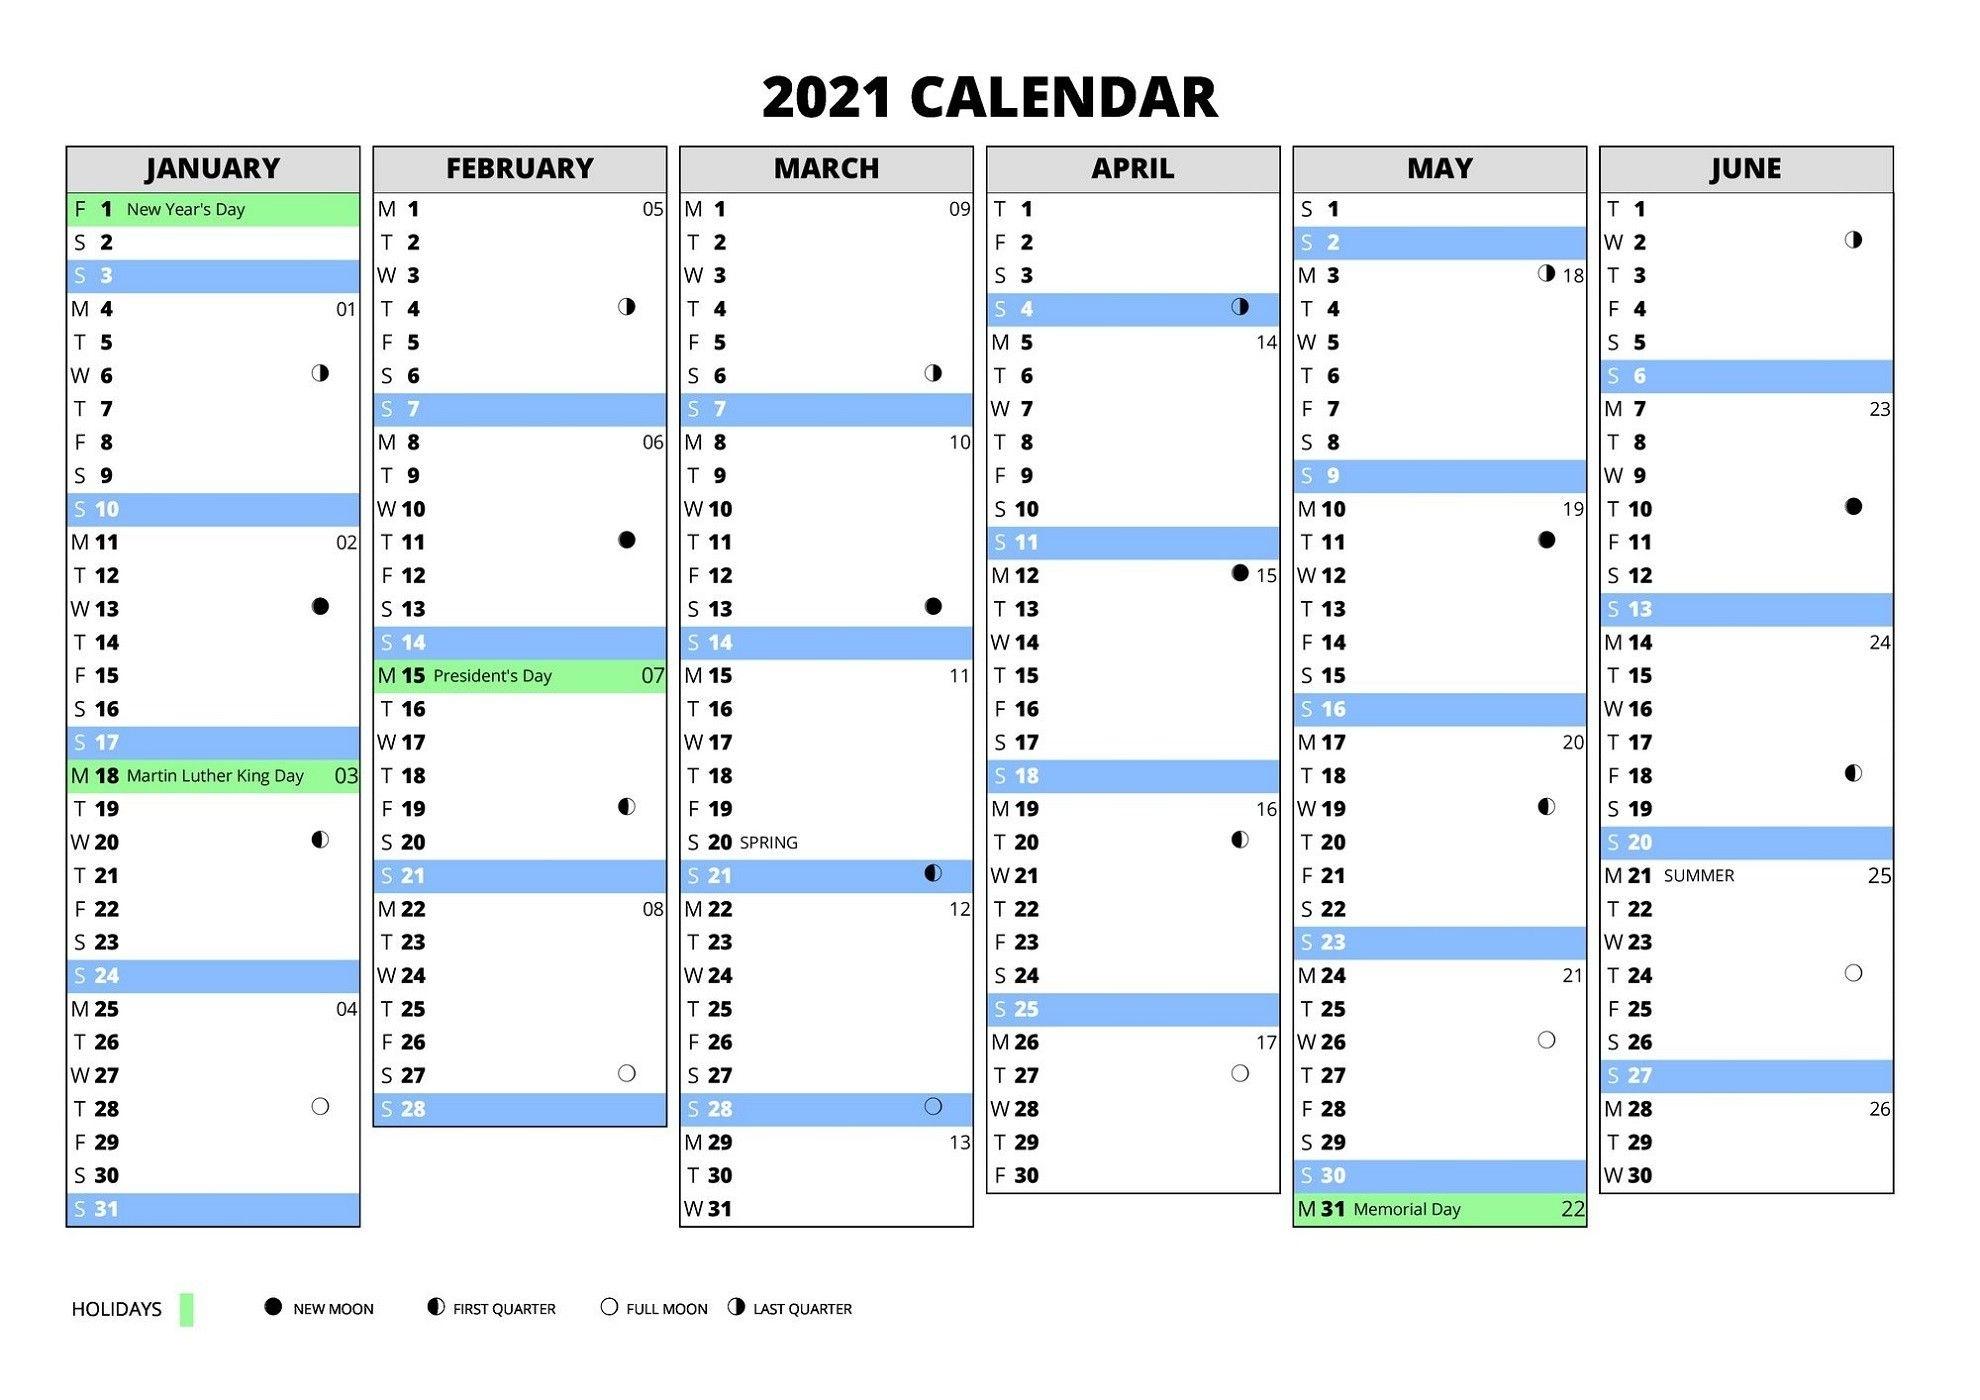 Pincalendar Design On Budgemom In 2020 | Excel Calendar